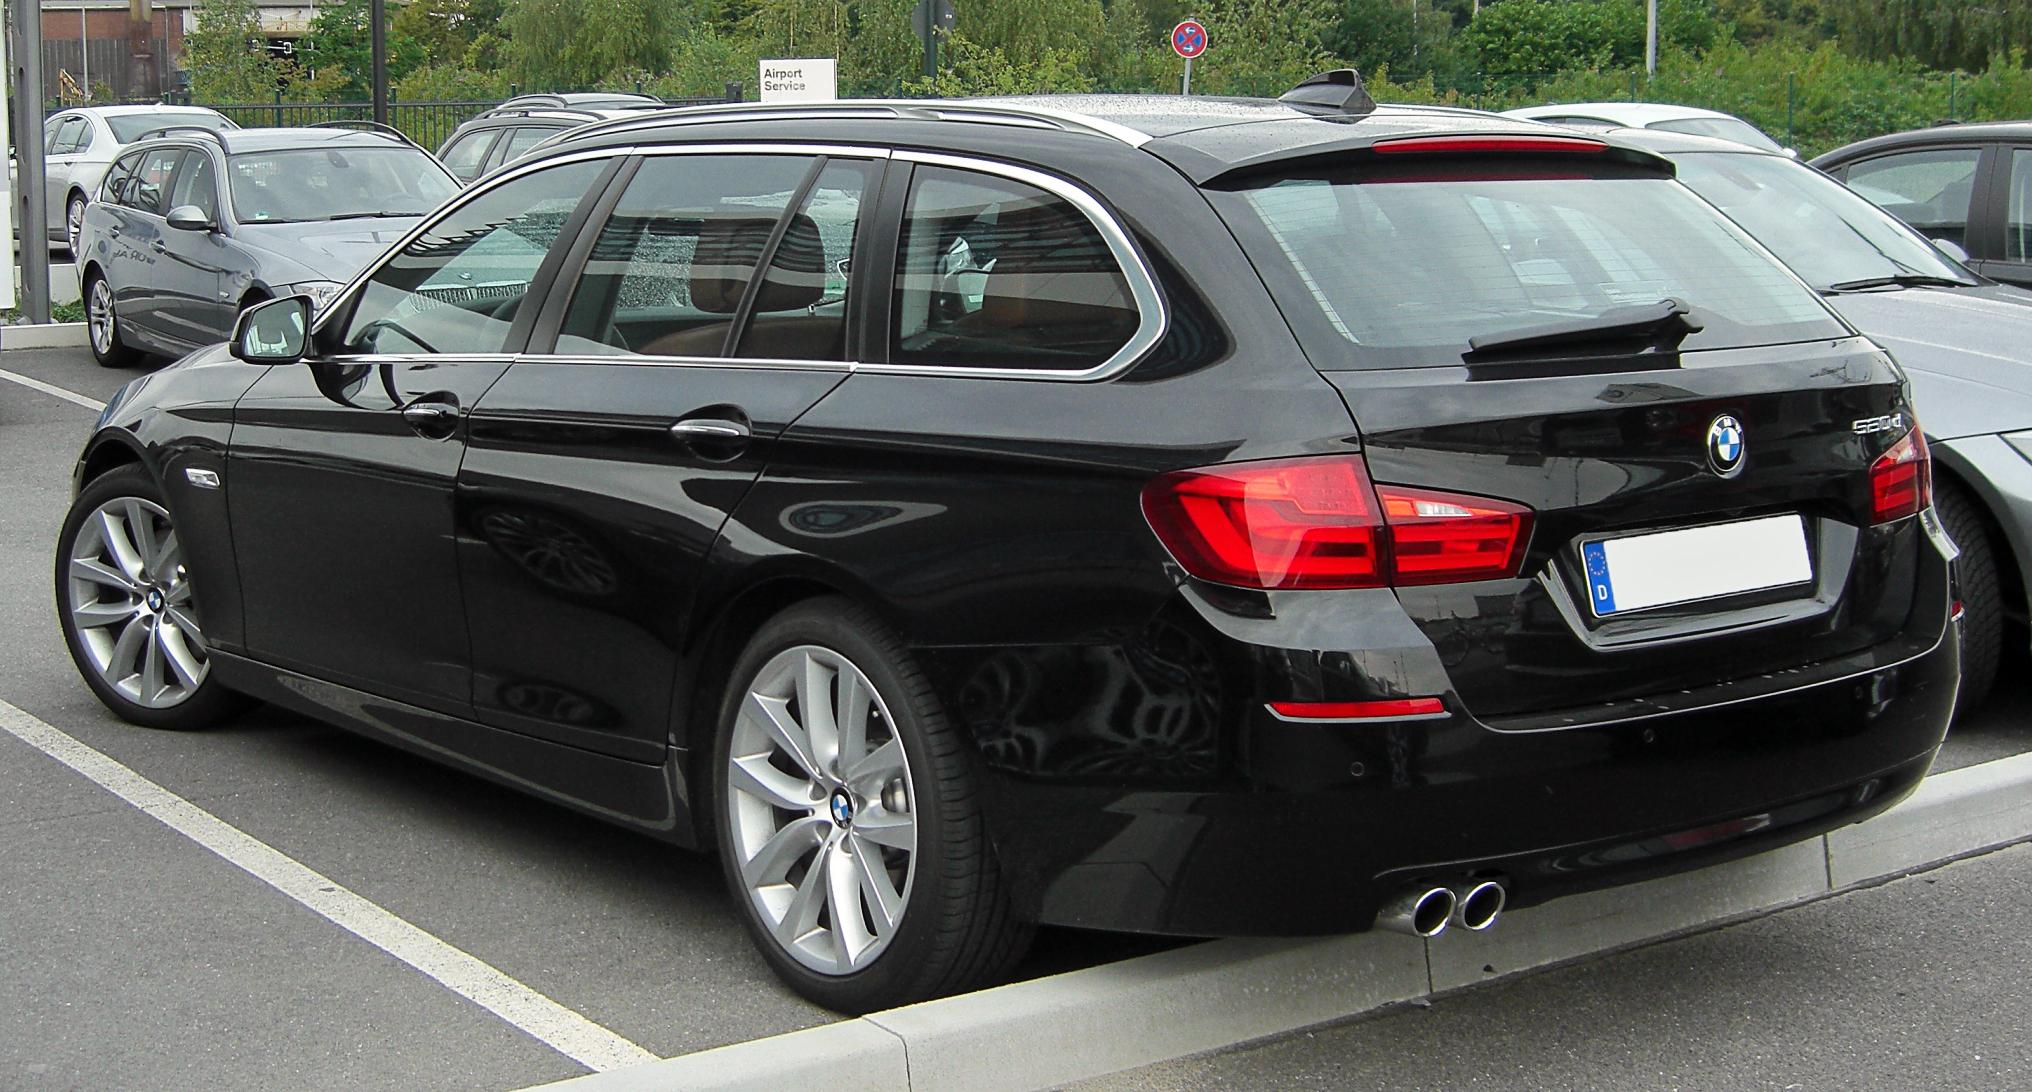 File:BMW 520d Touring (F11) rear 20100731.jpg - Wikipedia